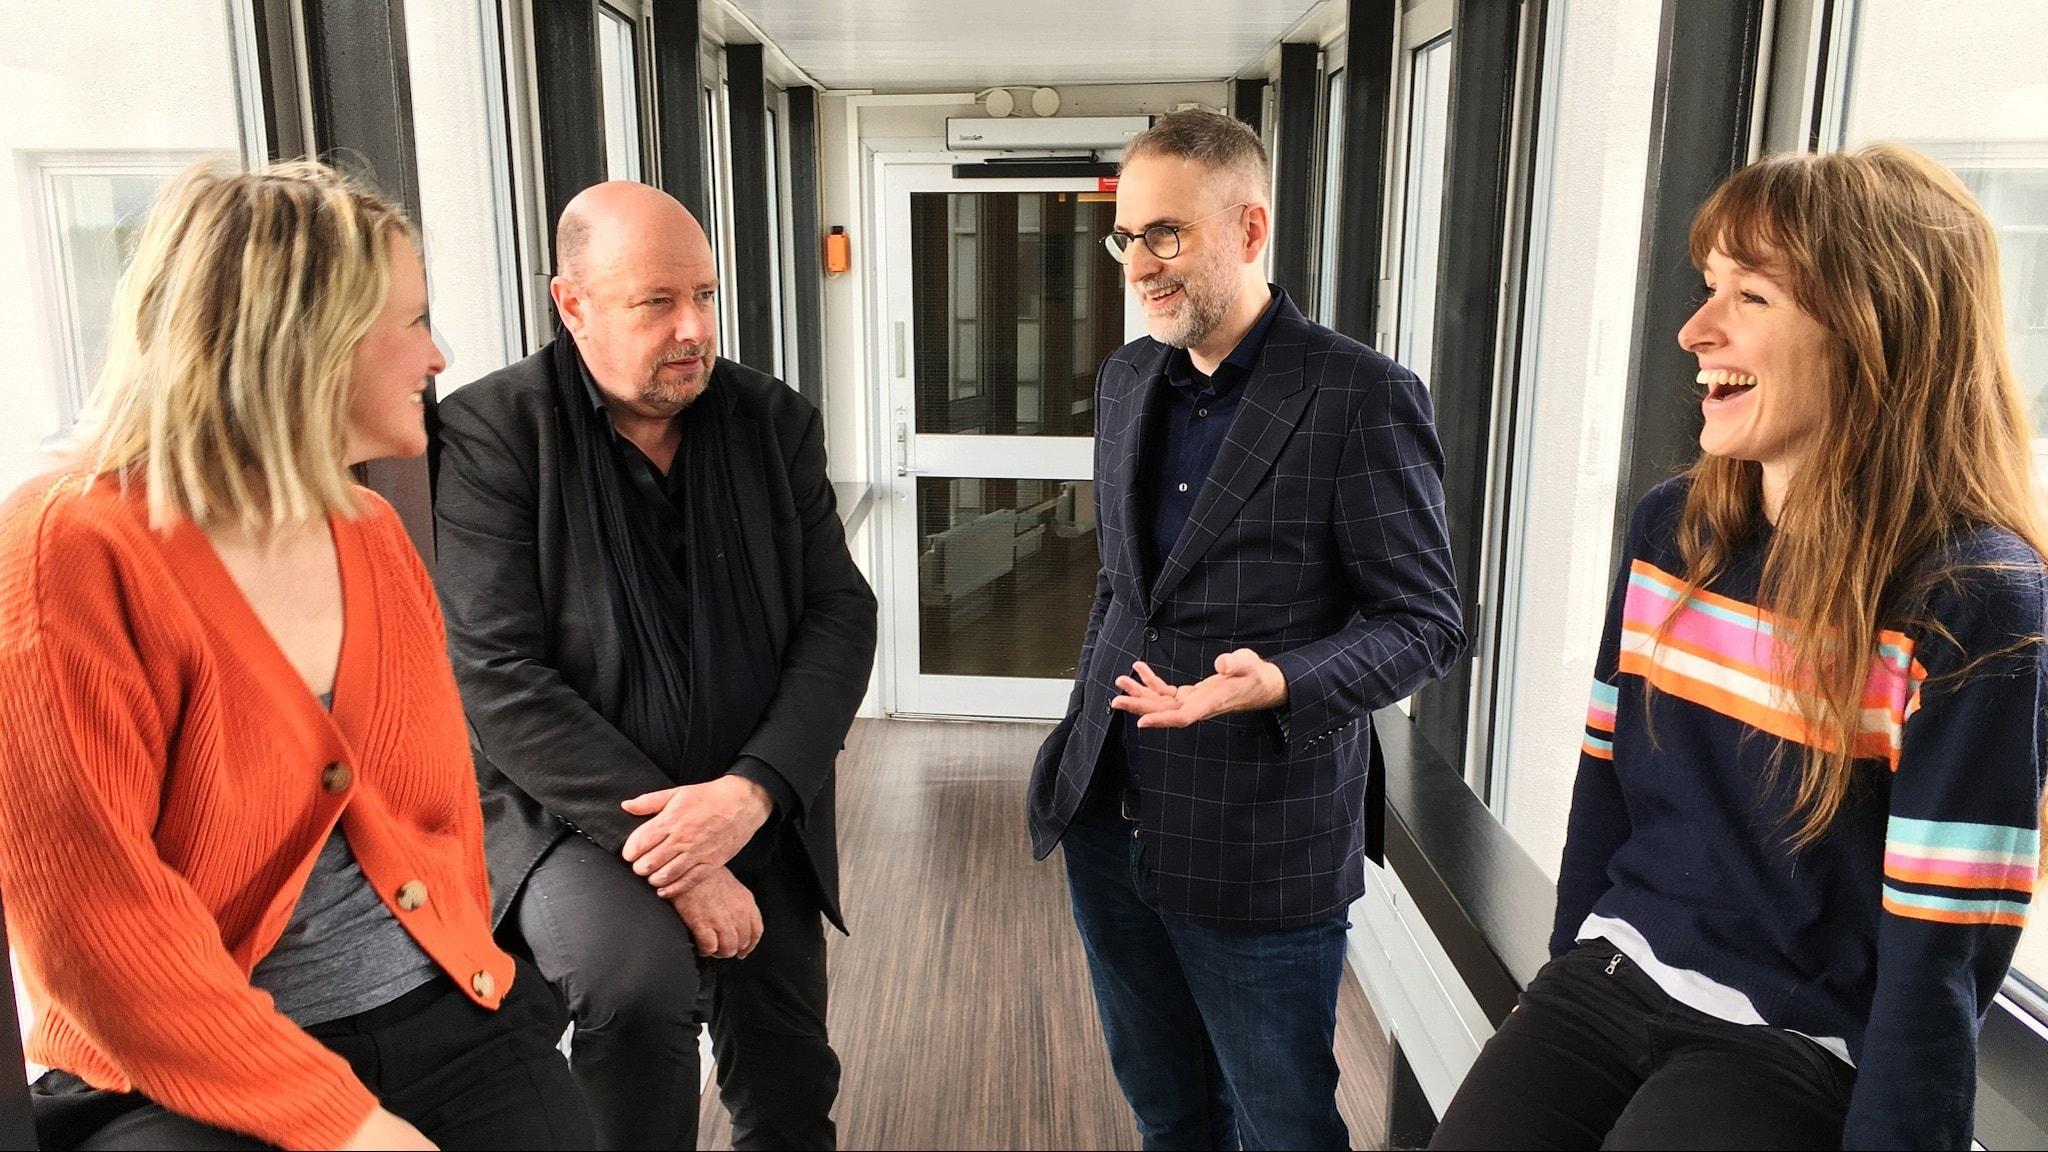 På bilden: Panelen bestående av Magnus Lindman, Aurélie Ferrière och Edith Söderström.